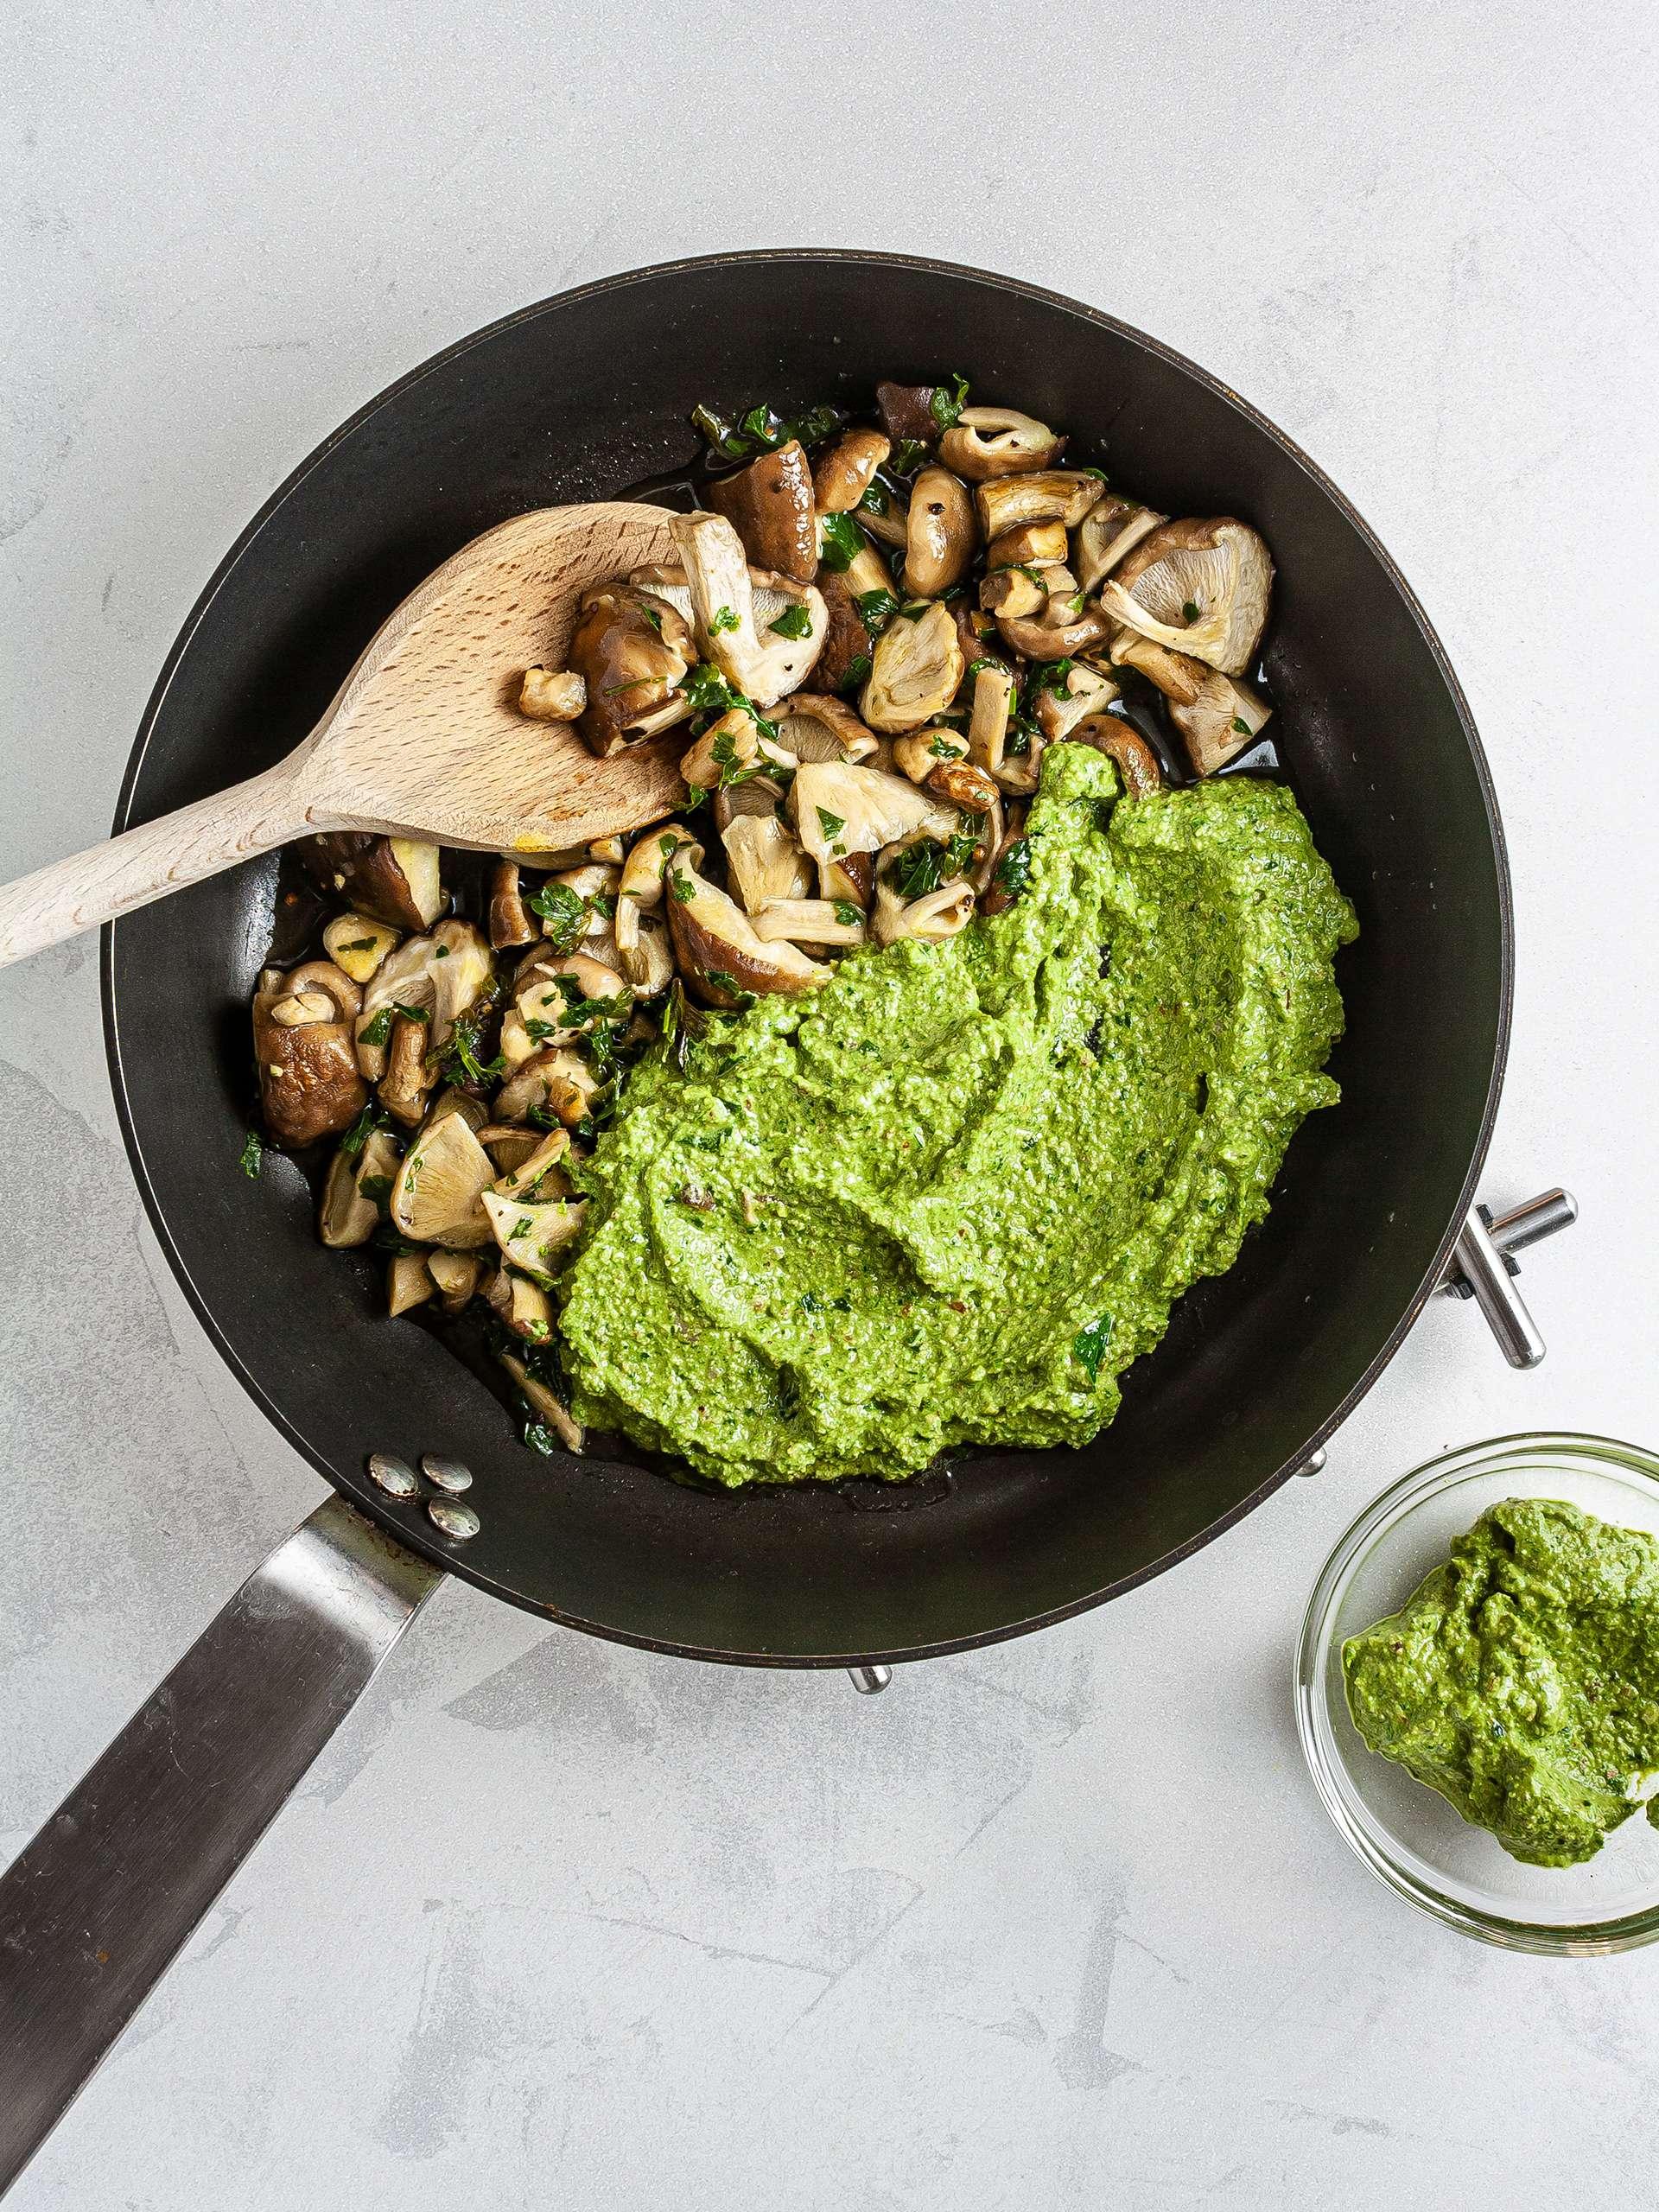 Spinach Pesto with mushrooms